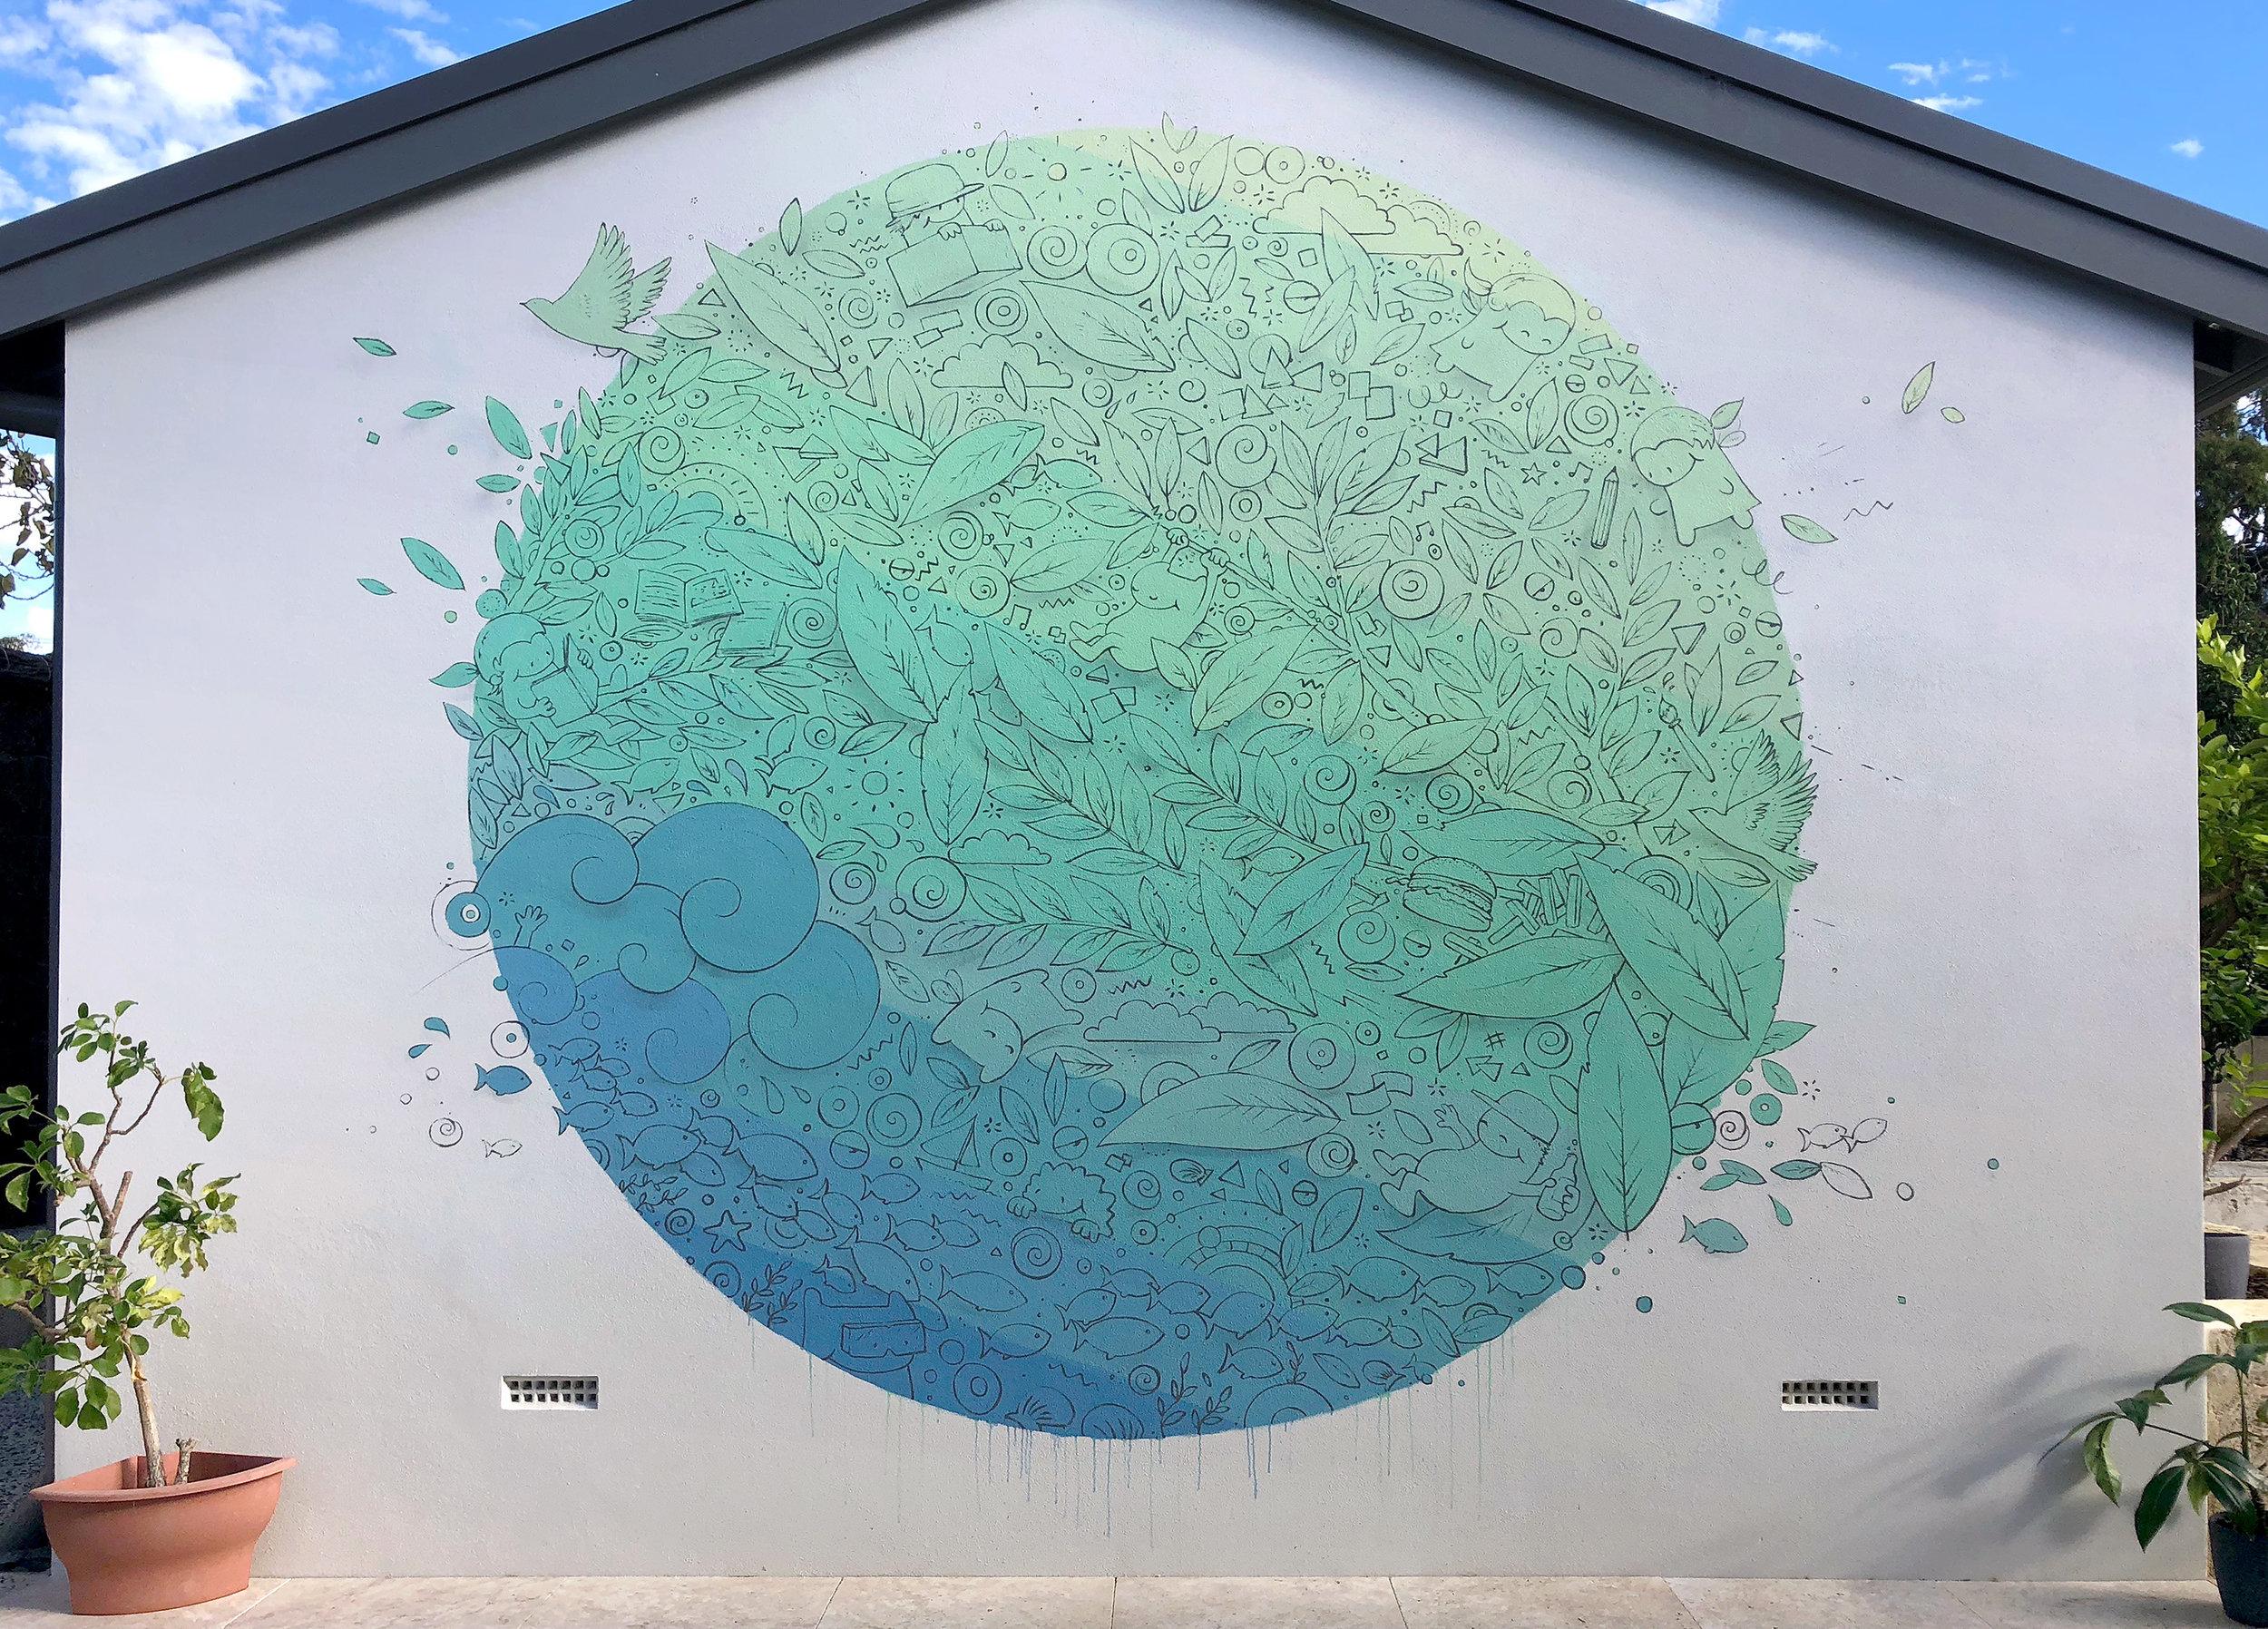 IanMutch_MosmanPark_mural_2018.jpg